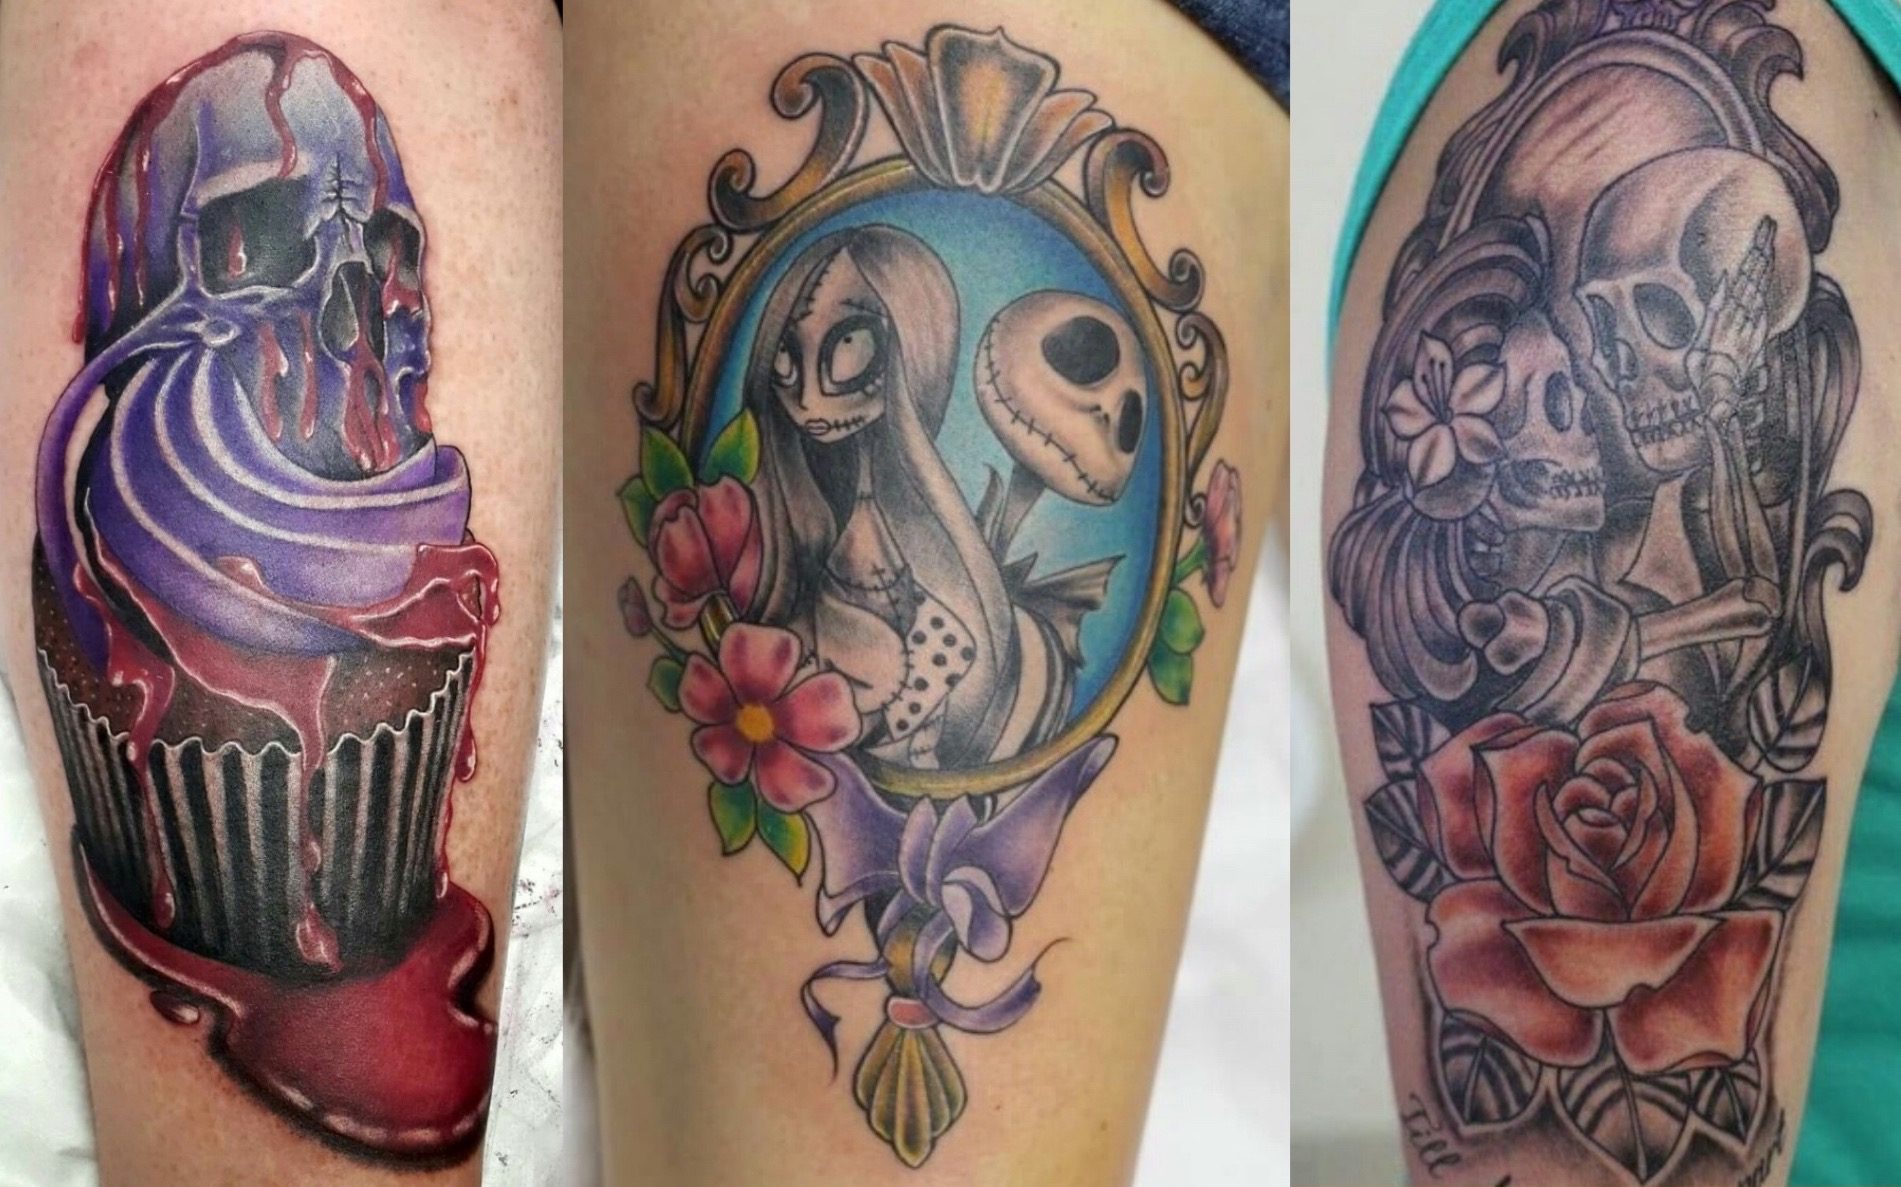 More tattoos done by Rudi Rautenbach